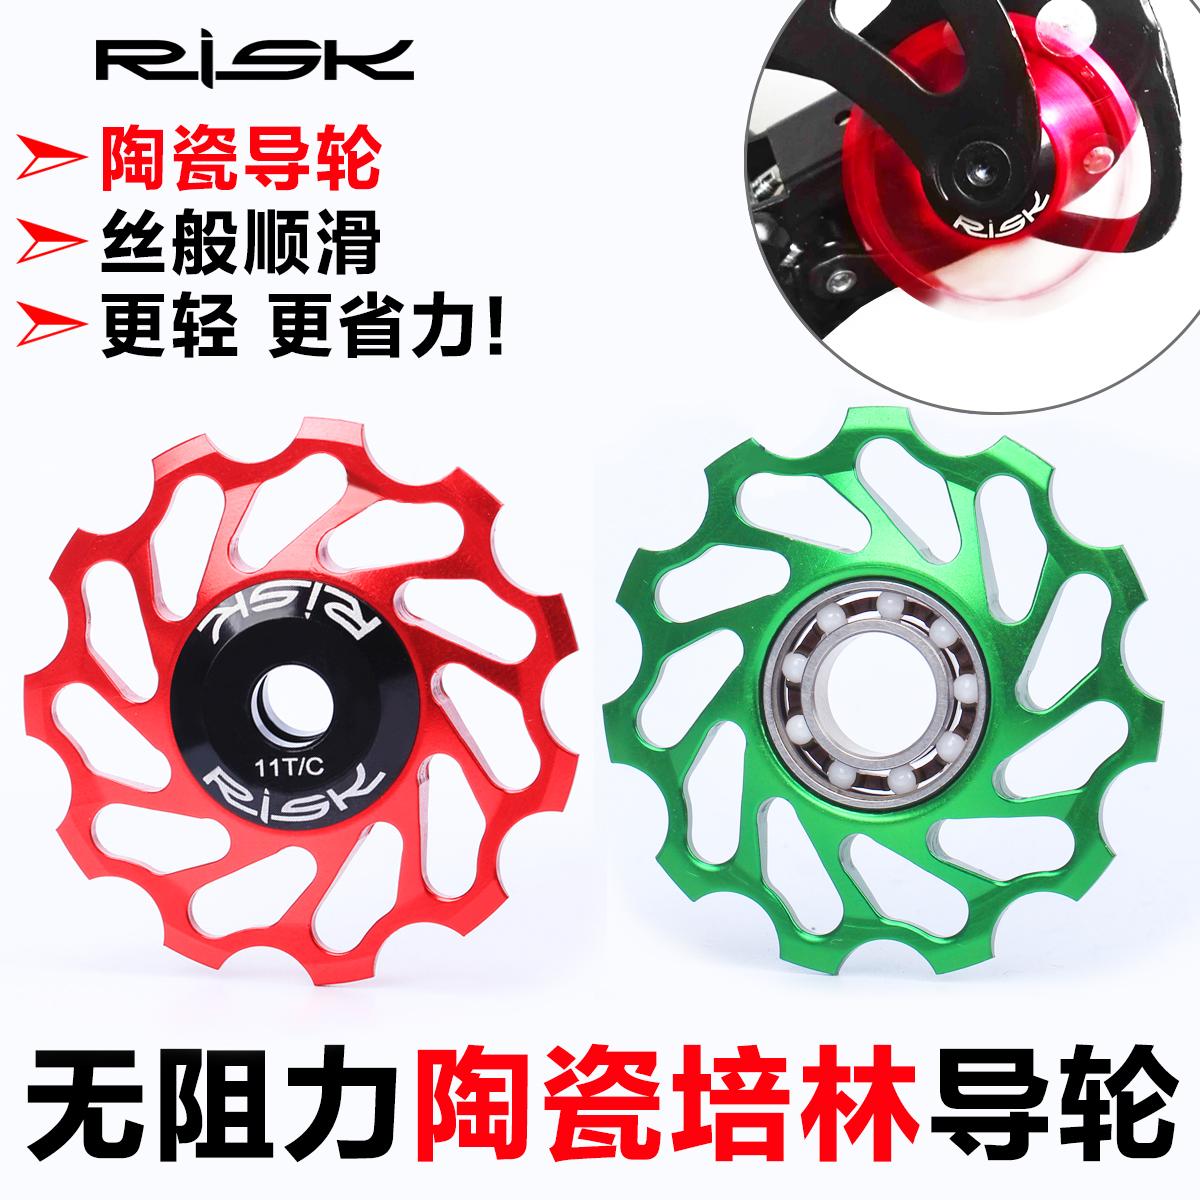 RISK山地公路自行车后拨11T齿导轮铝合金超轻陶瓷培林轴承XT XTR